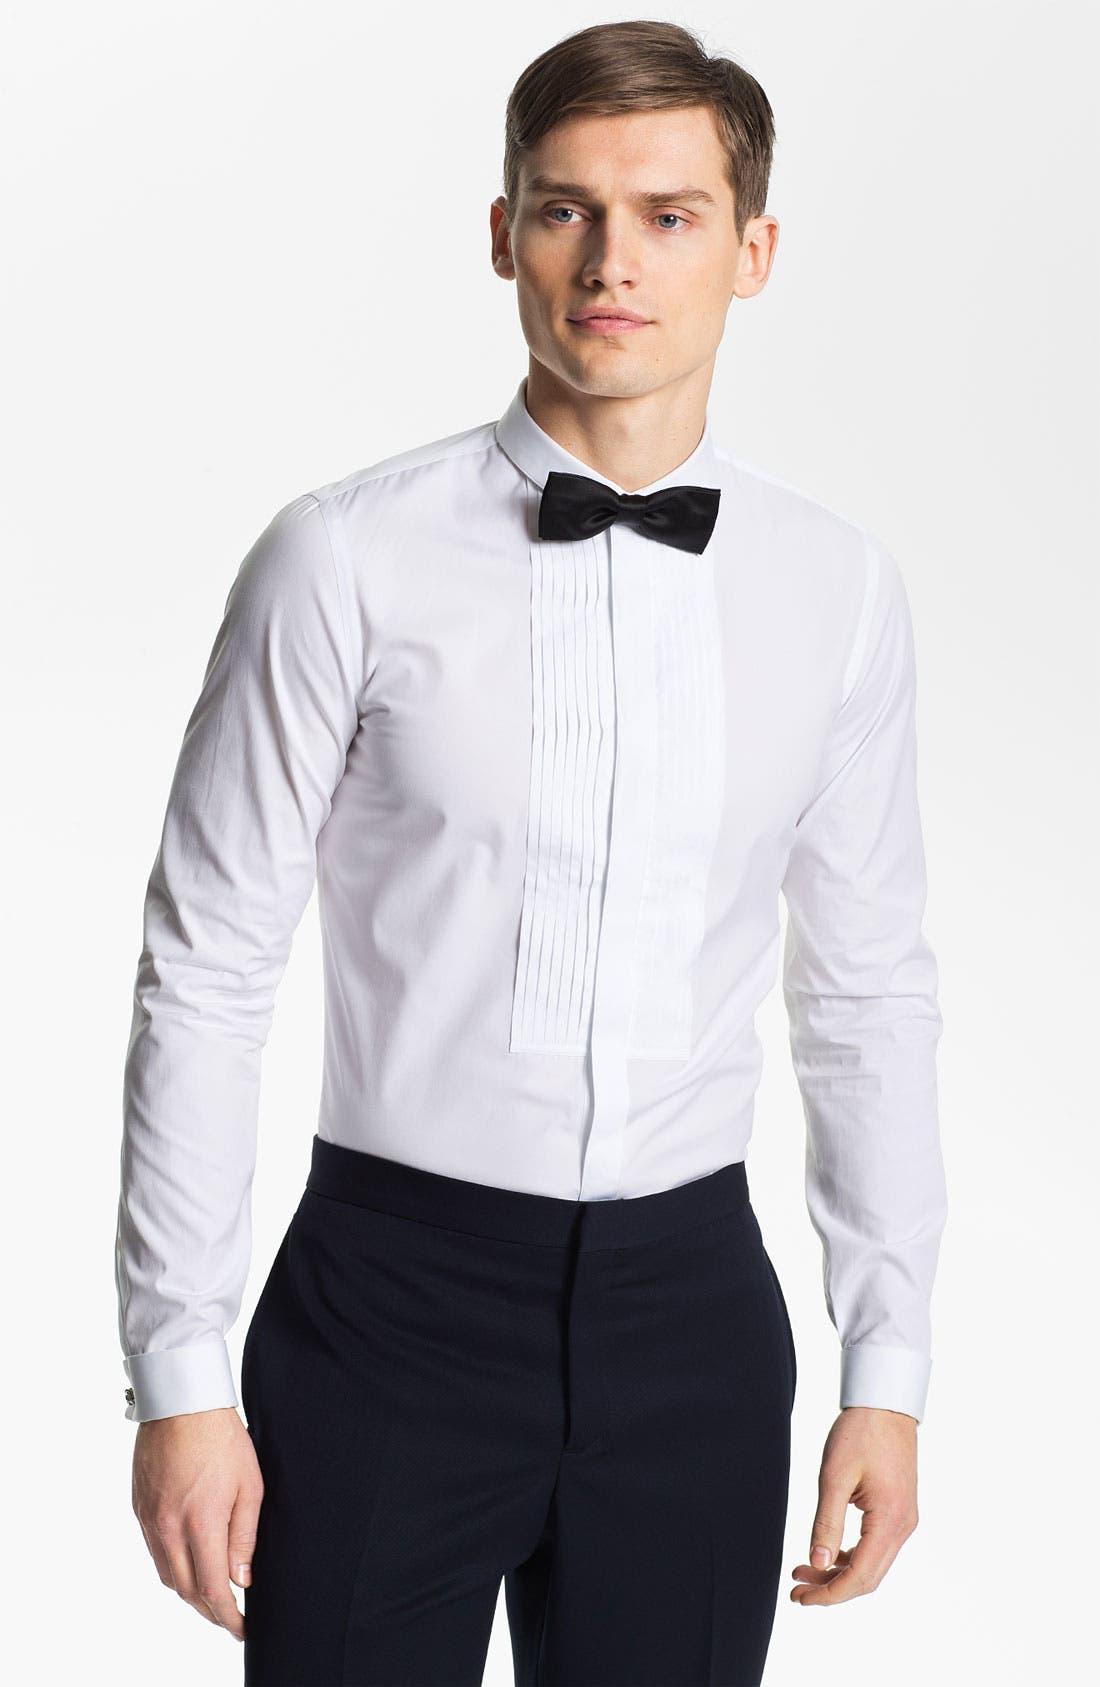 Main Image - Burberry Prorsum Cotton Poplin Tuxedo Shirt